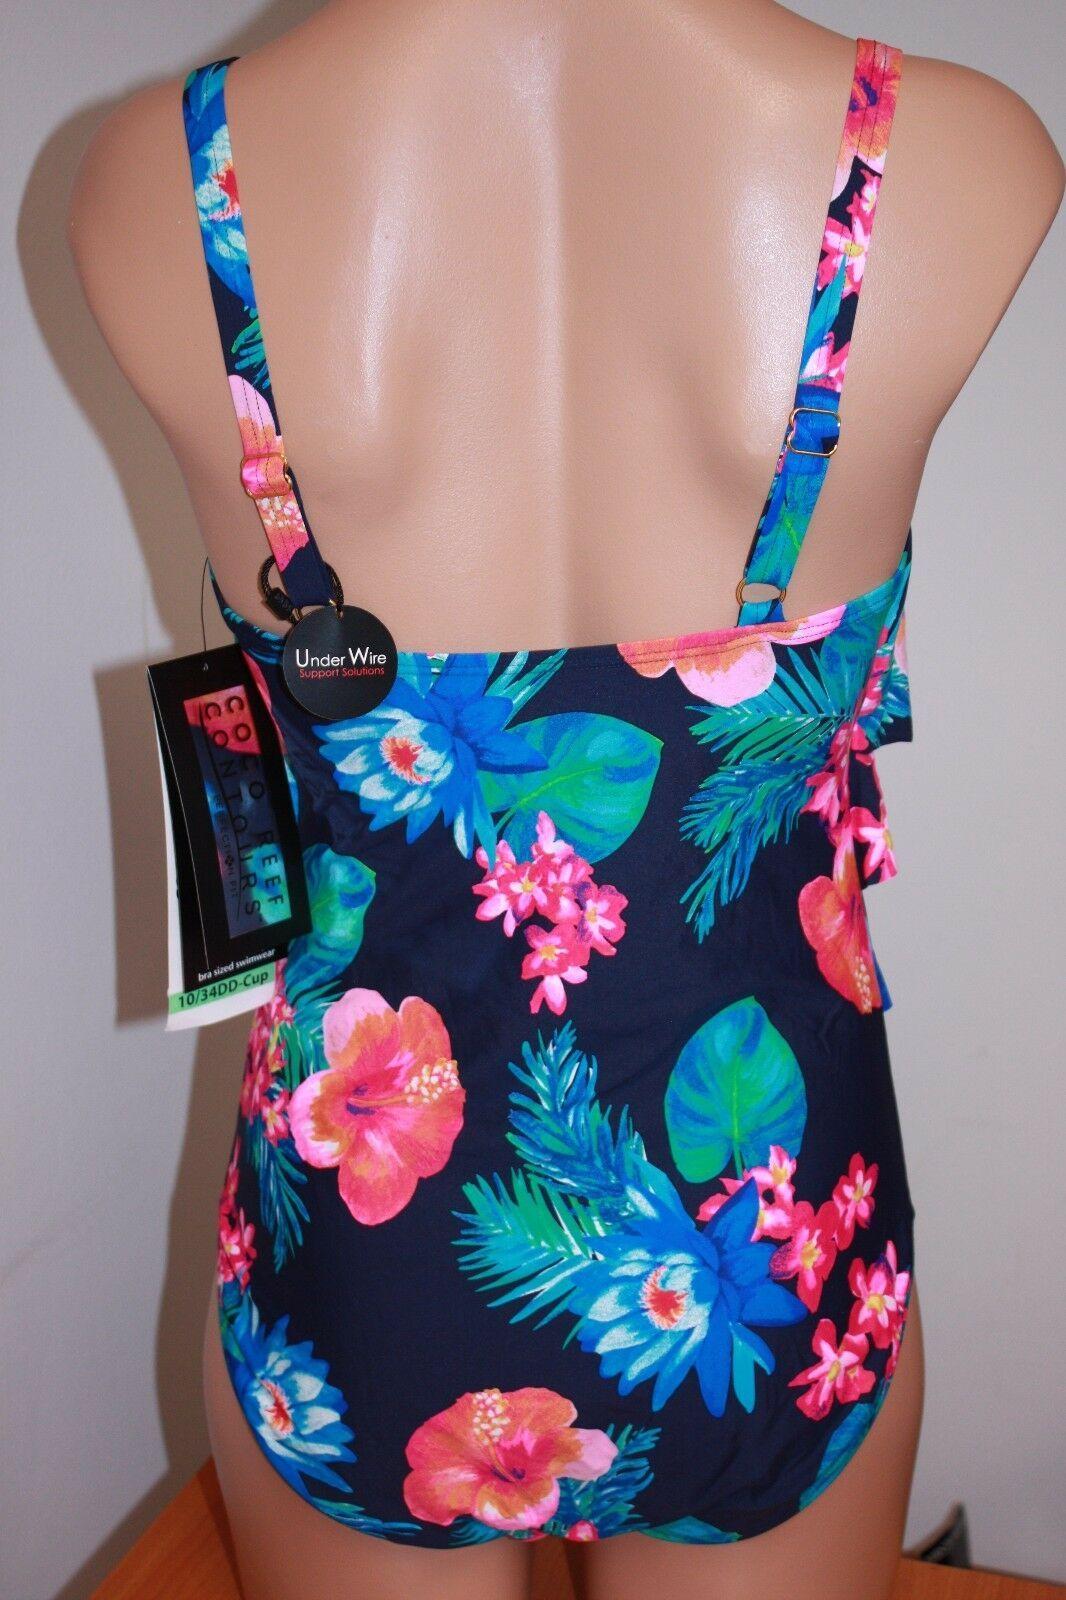 NWT Coco Reef Swimsuit Bikini 1 one  piece Sz 10 34DD  Ruffle Maillot Navy Capta